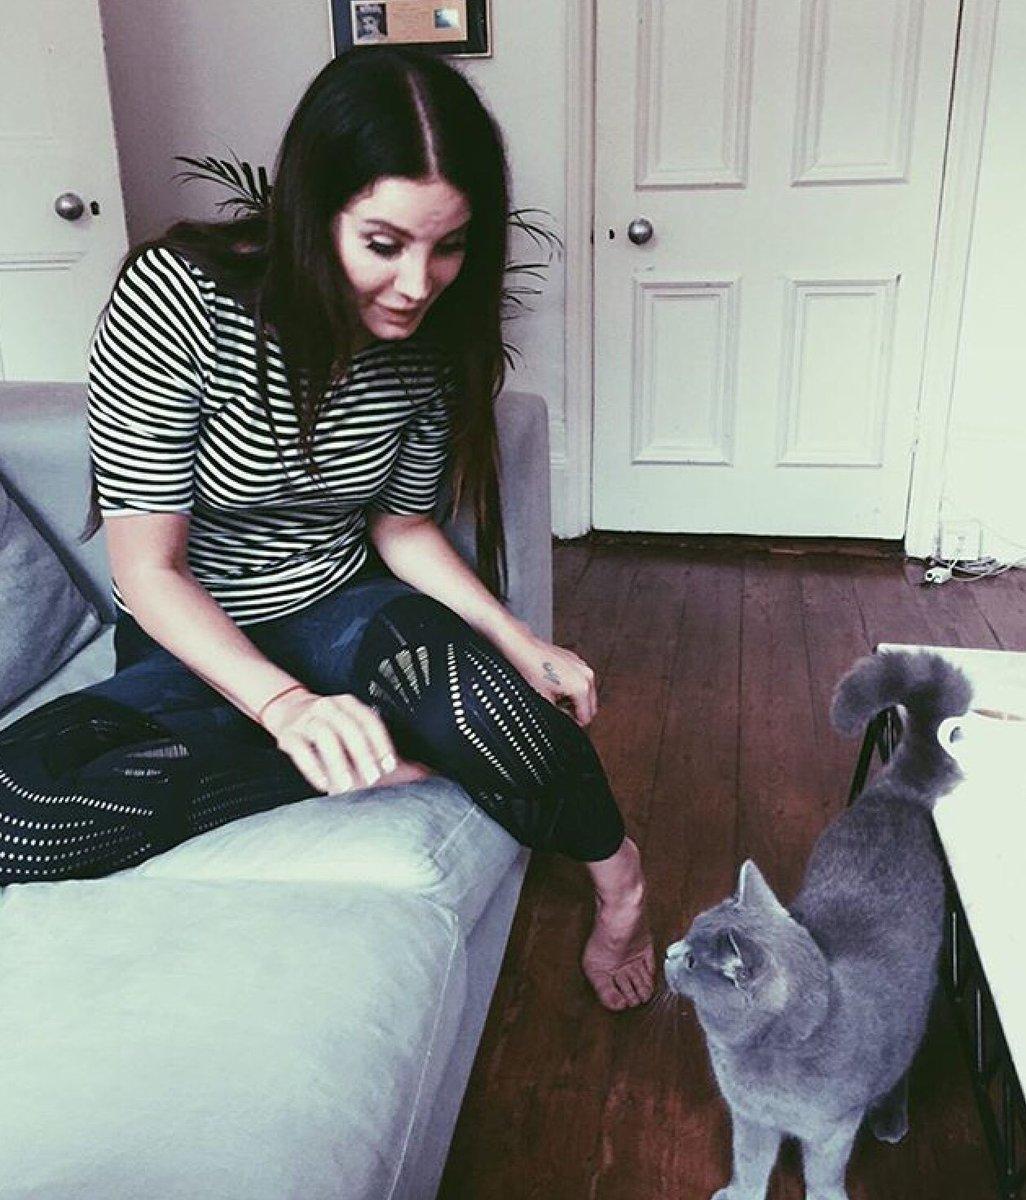 Marina Diamandis publica foto de Lana Del Rey brincando com sua xana no Instagram https://t.co/cWTKcObyQX https://t.co/ydxjnul35W